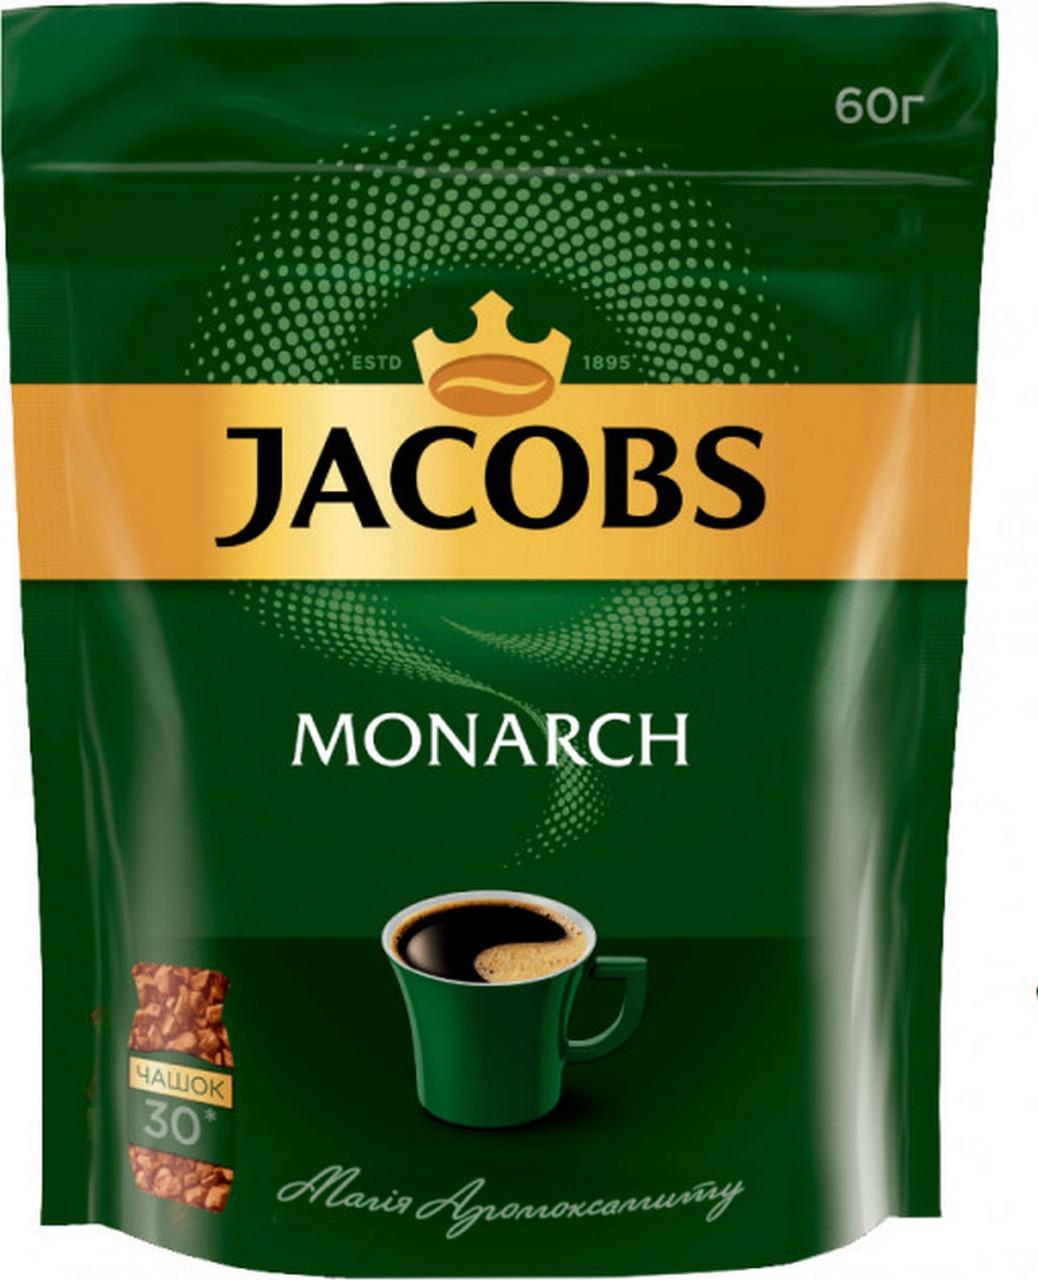 JACOBS MONARCH 60г (ЯКОБС МОНАРХ 60г)